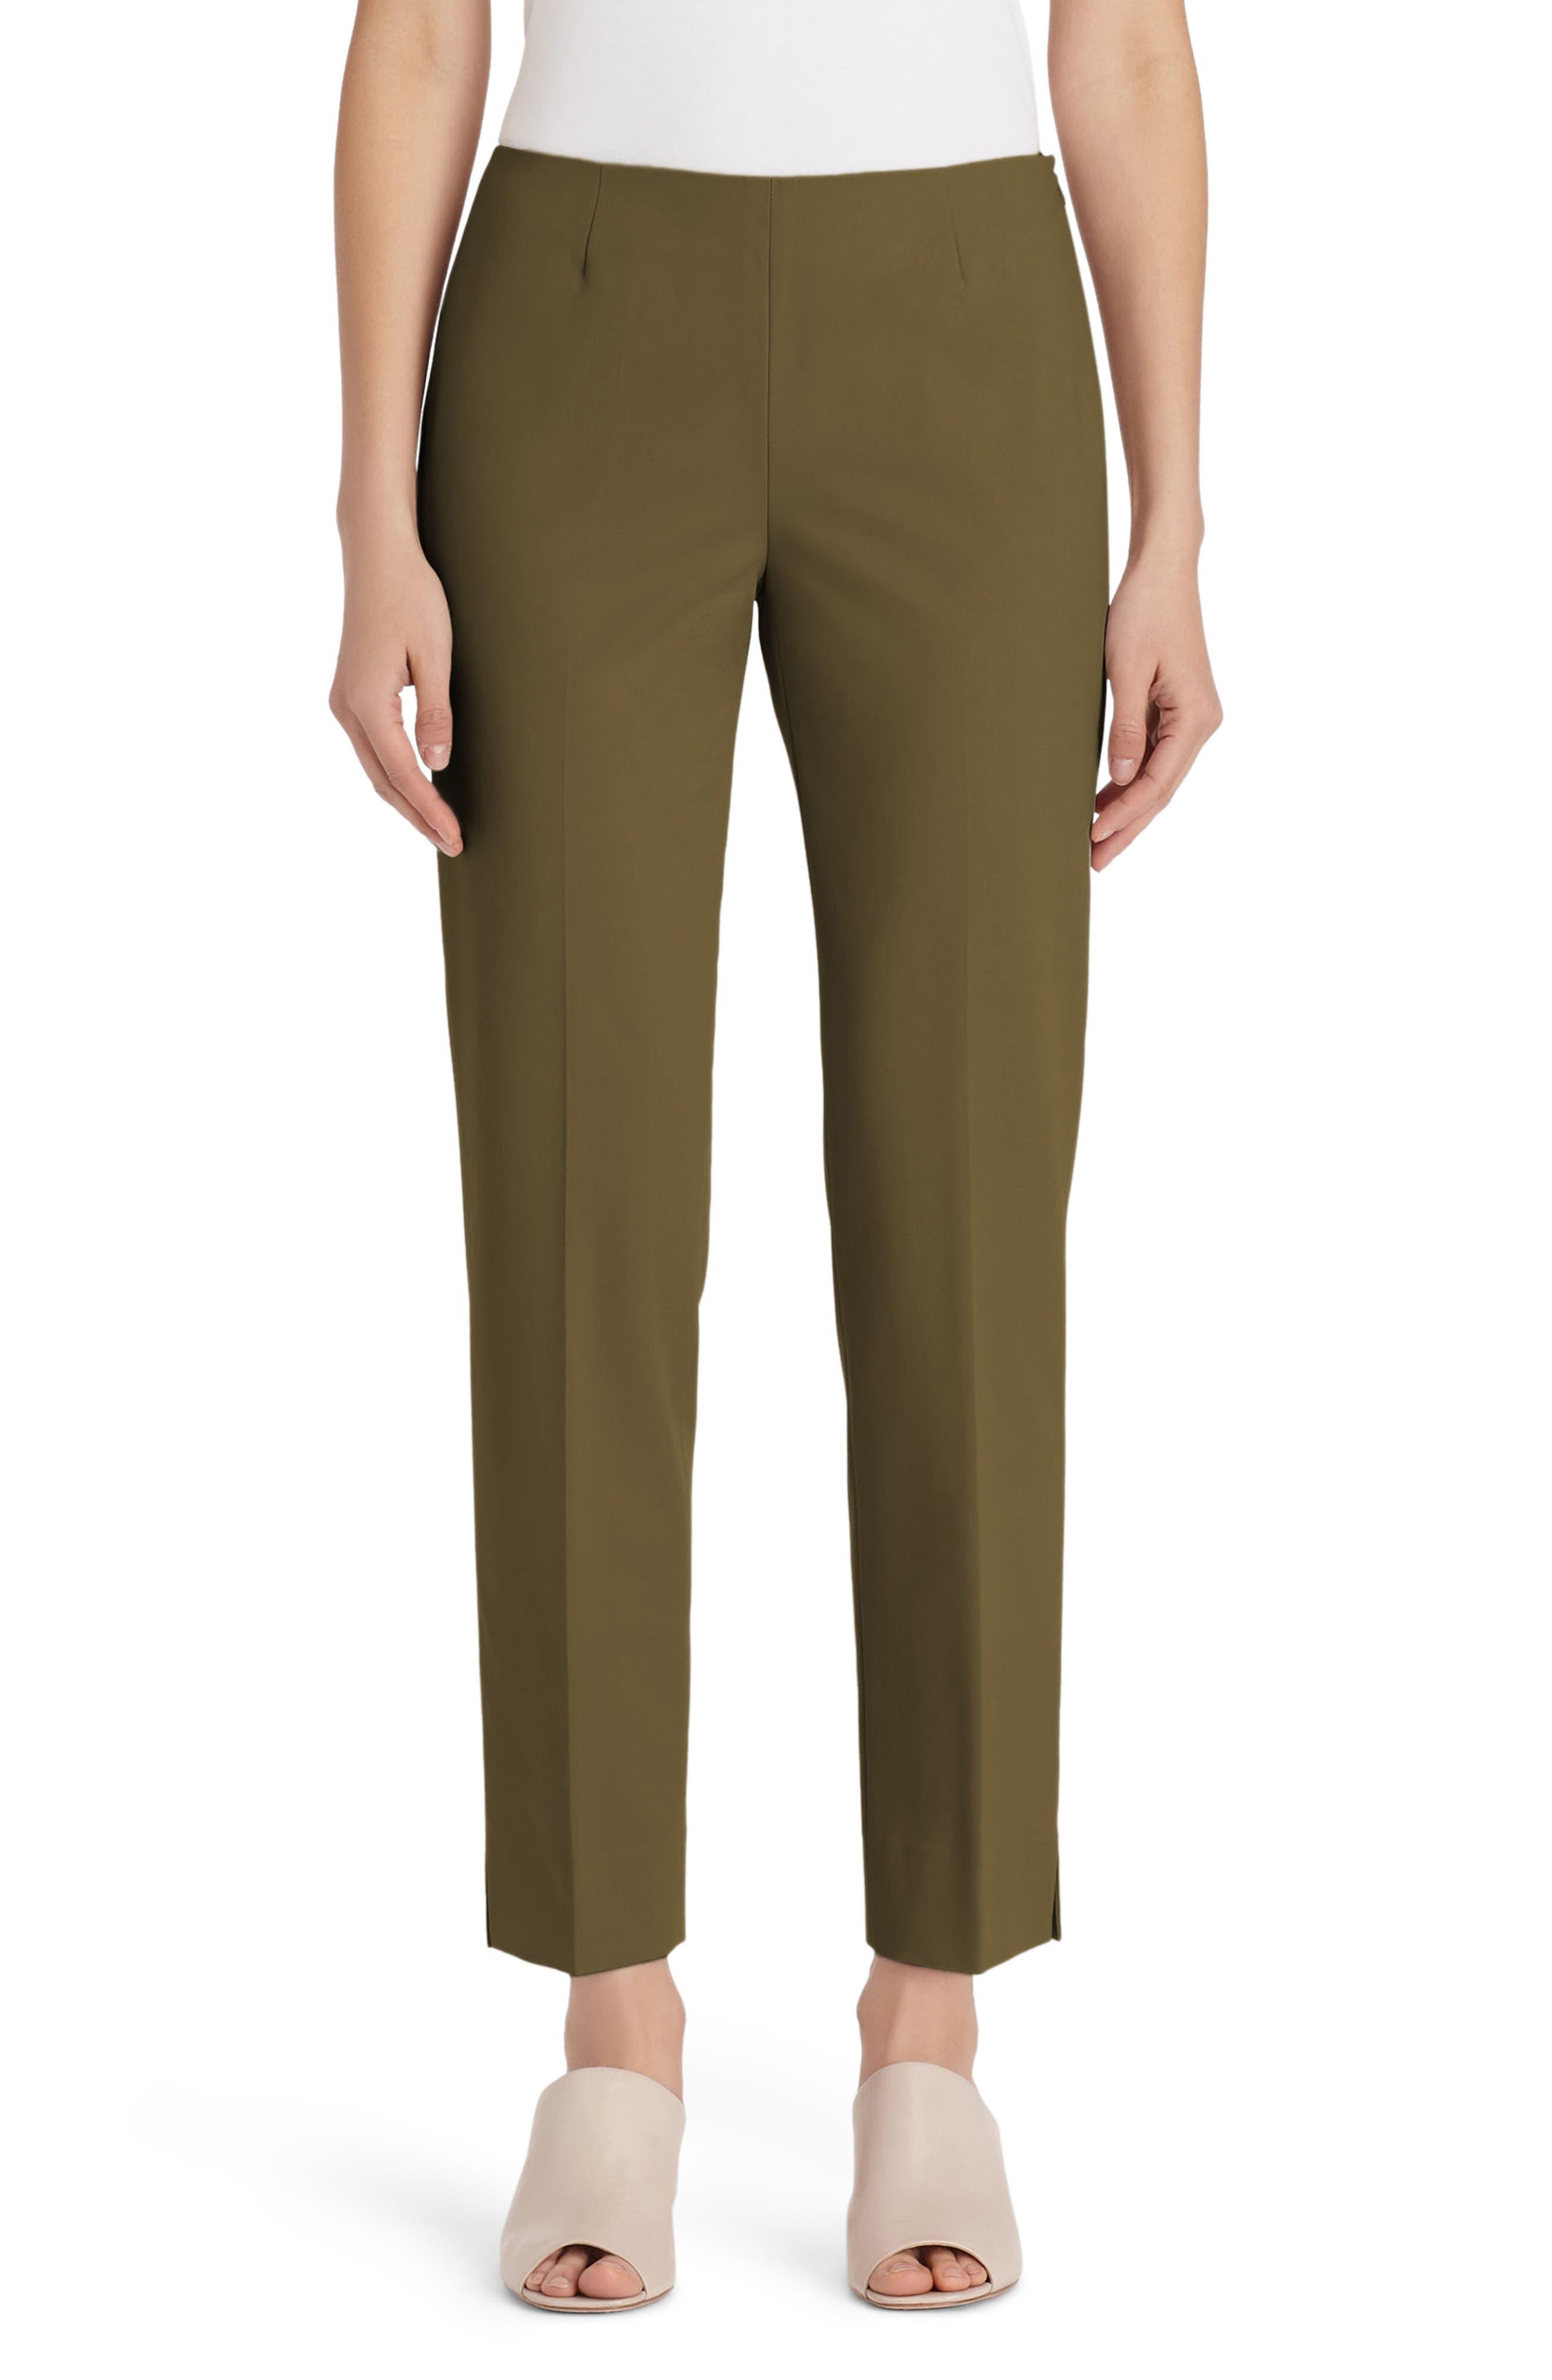 Alternate Image 1 Selected - Lafayette 148 New York Lexington Crop Pants